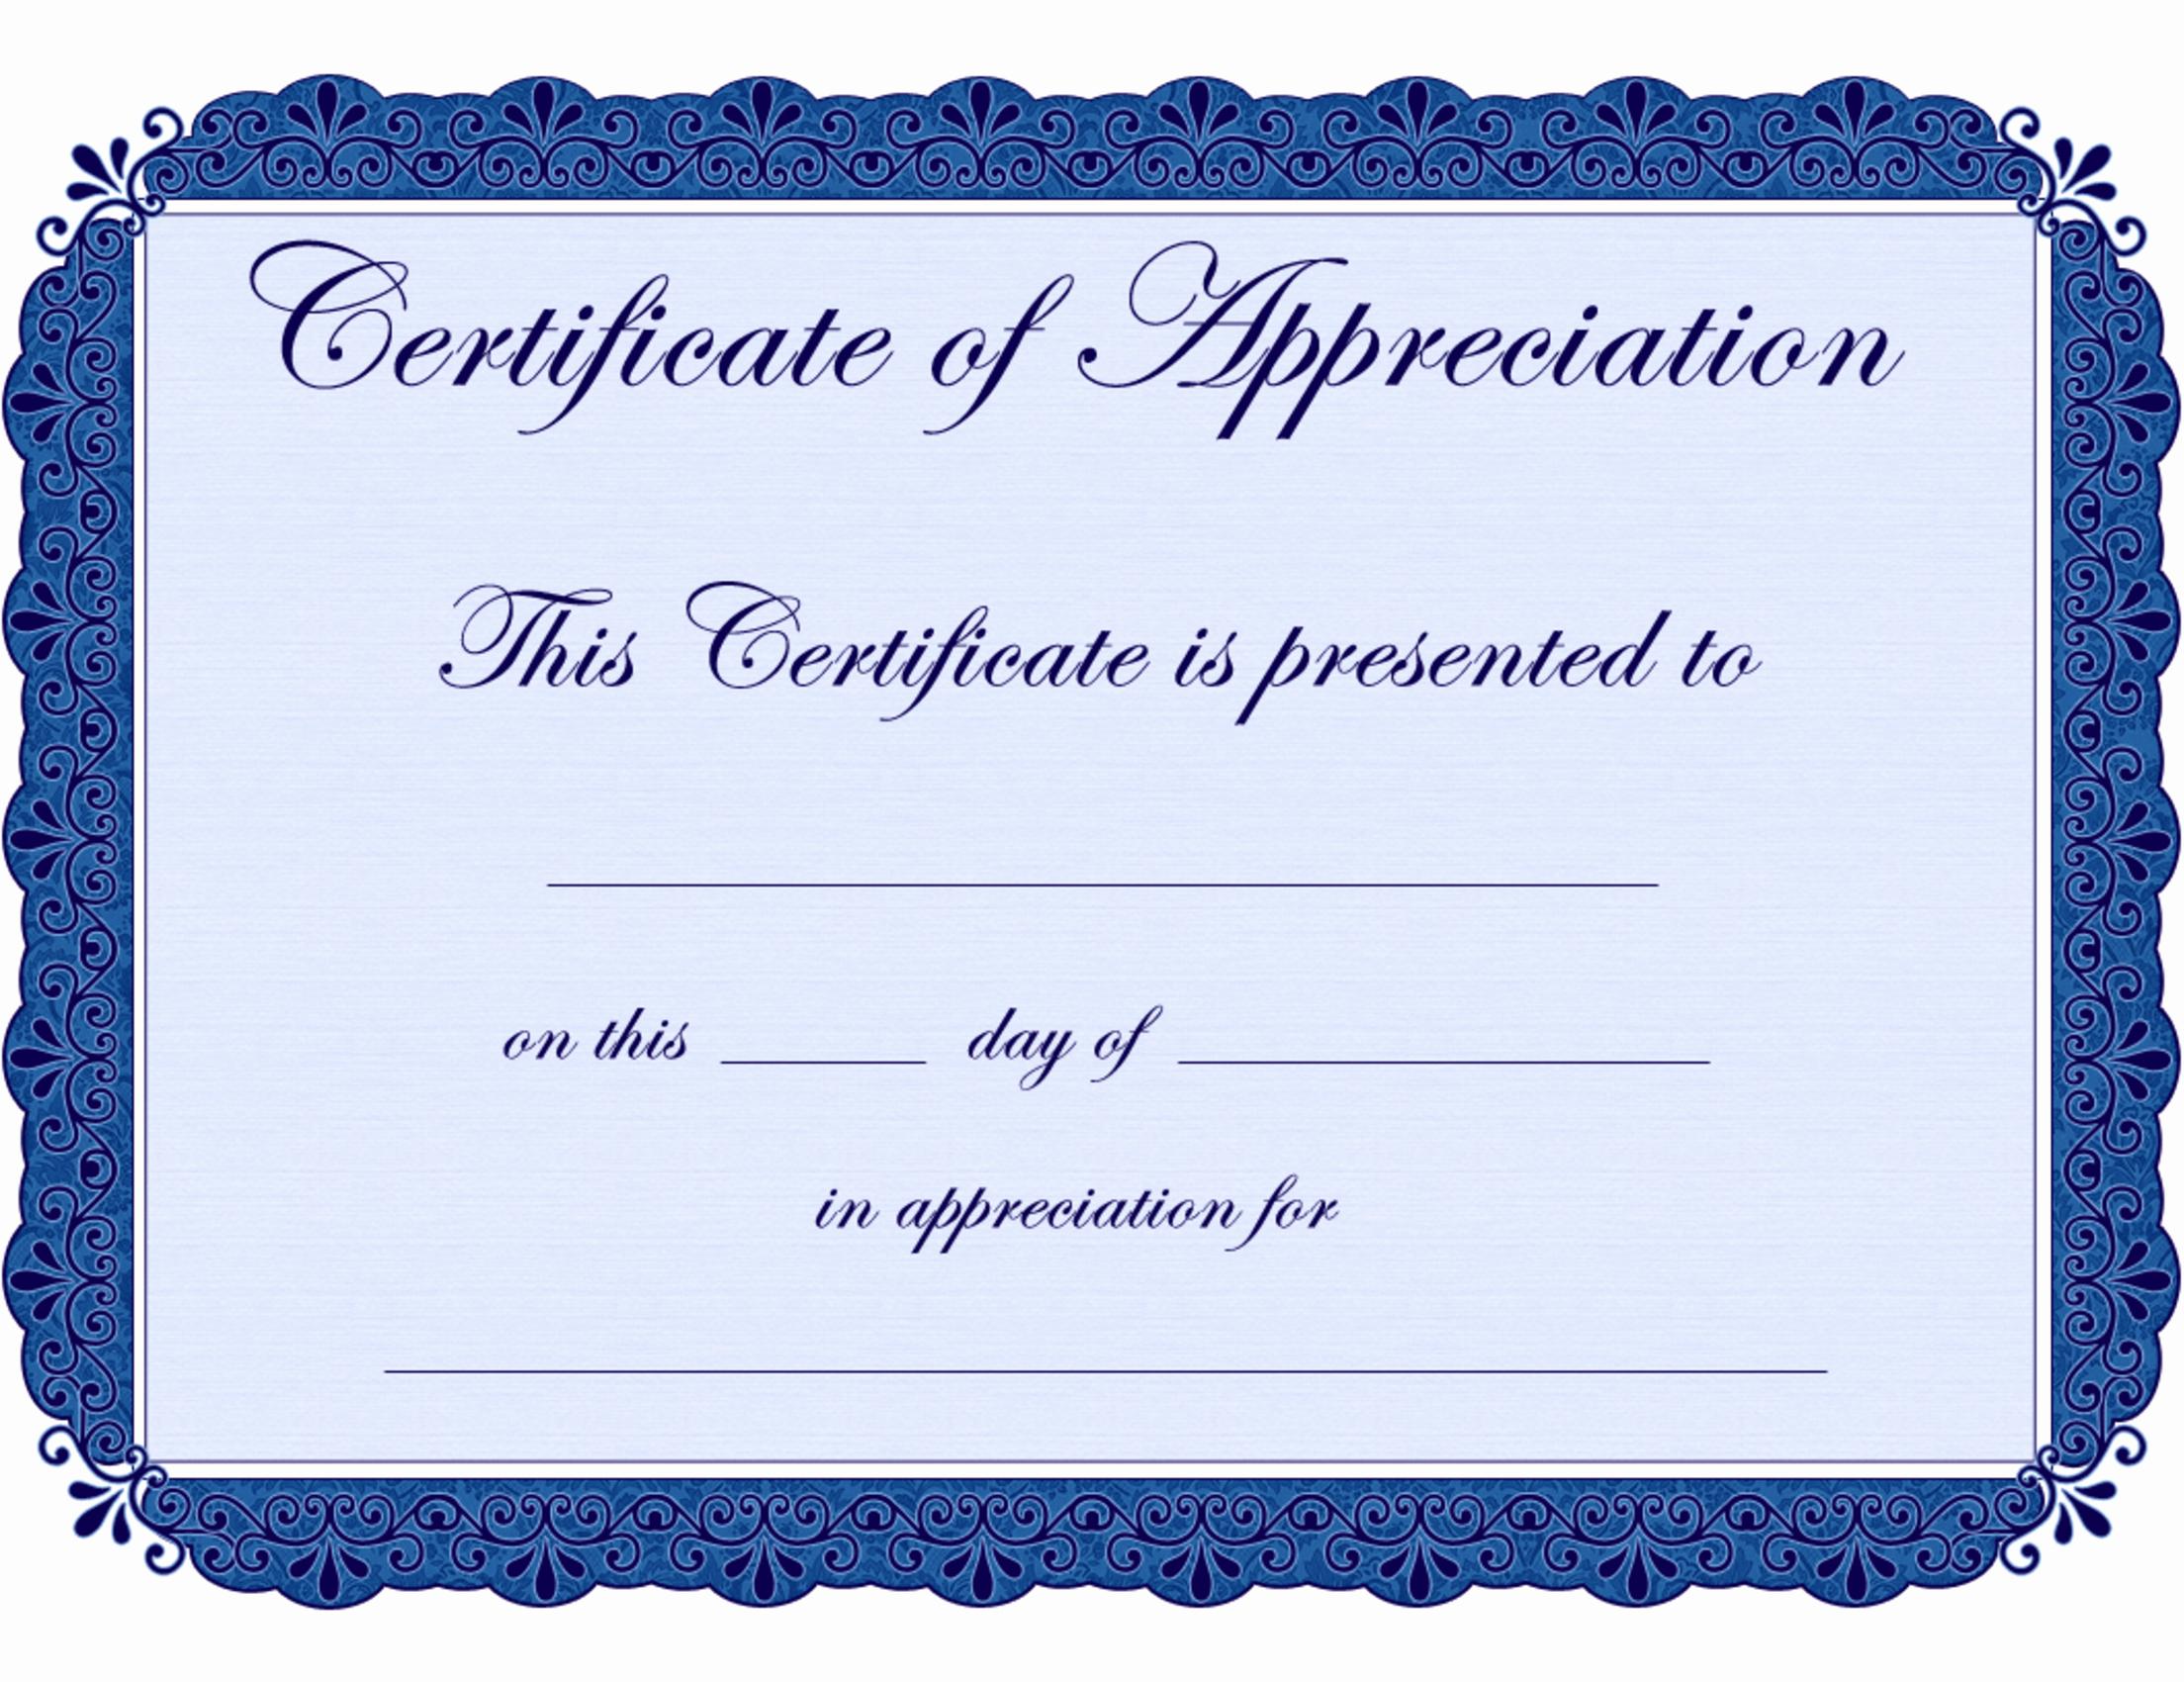 Printable Certificate Of Appreciation Template Lovely Free Printable Certificates Certificate Of Appreciation